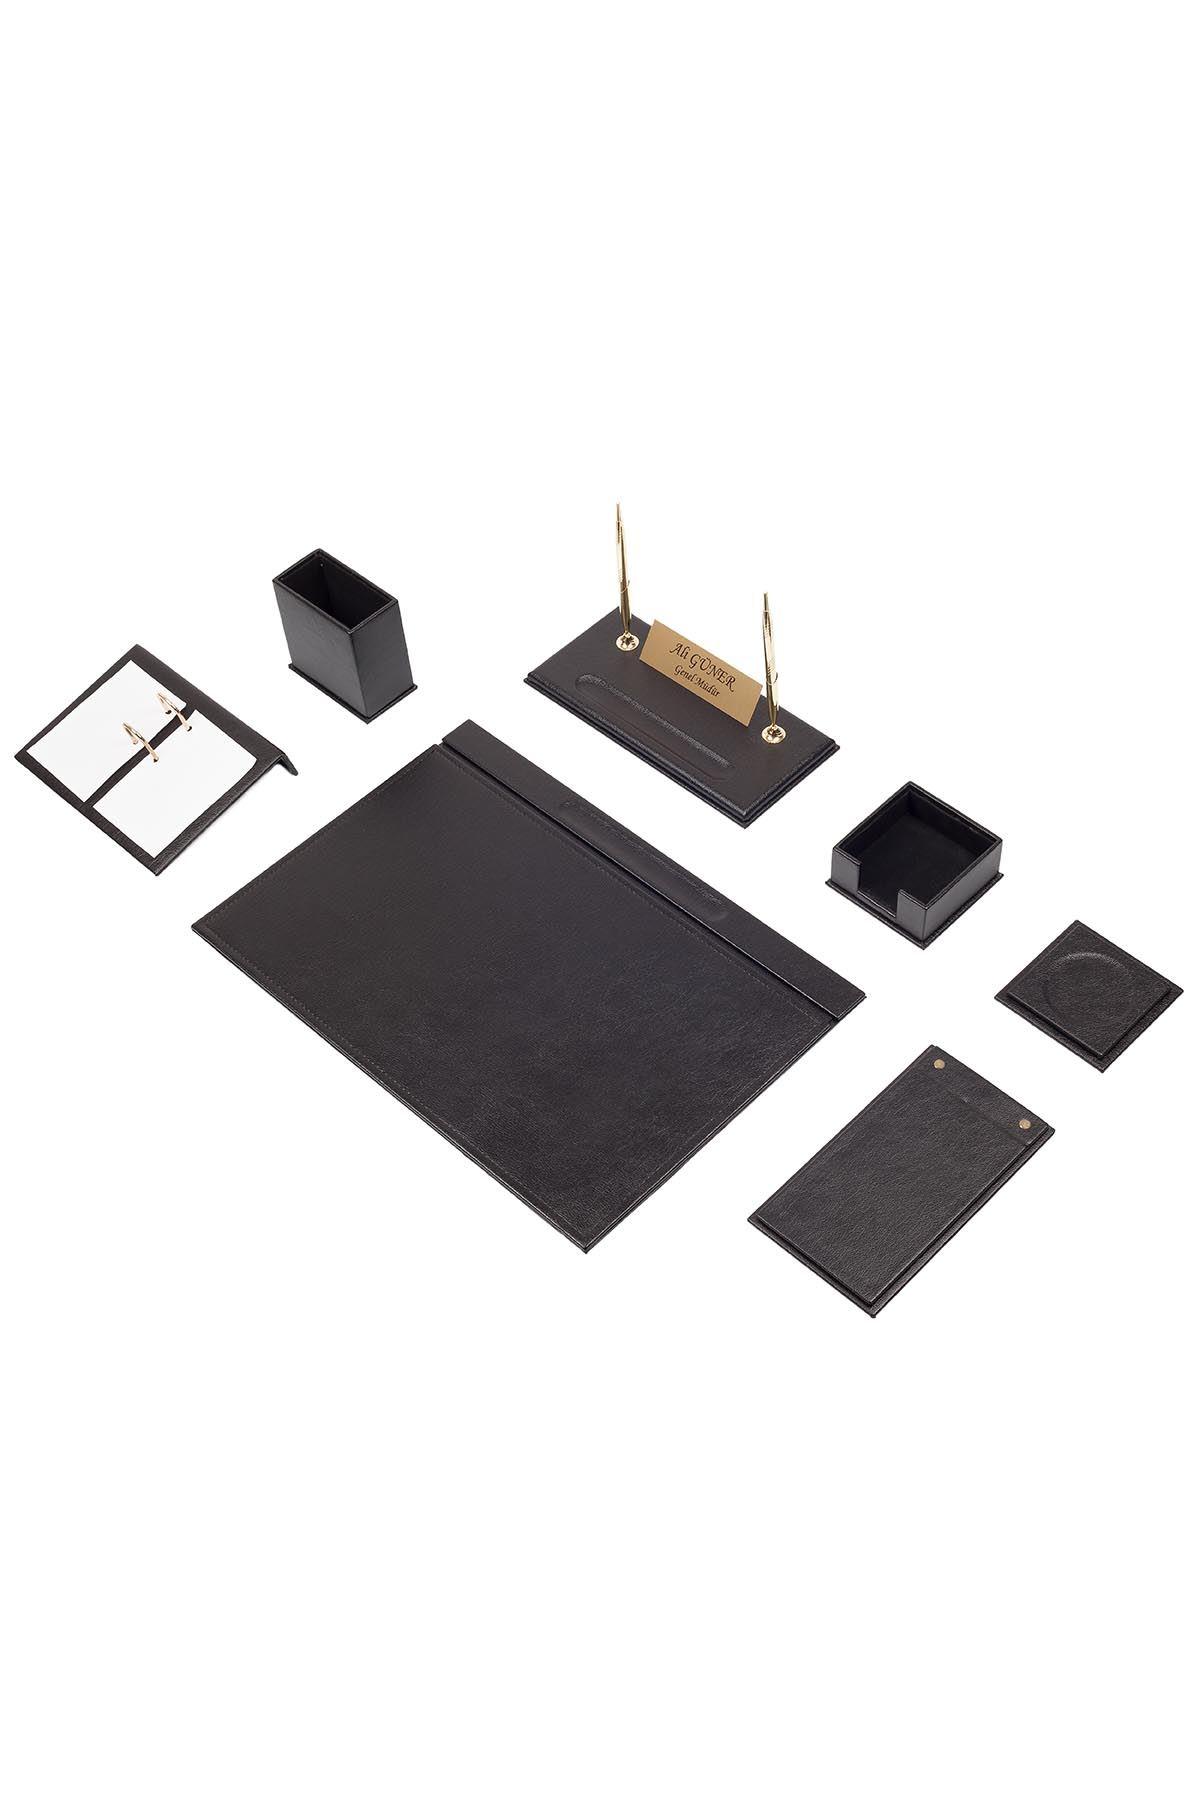 Leather Desk Set 9 Accessories Black